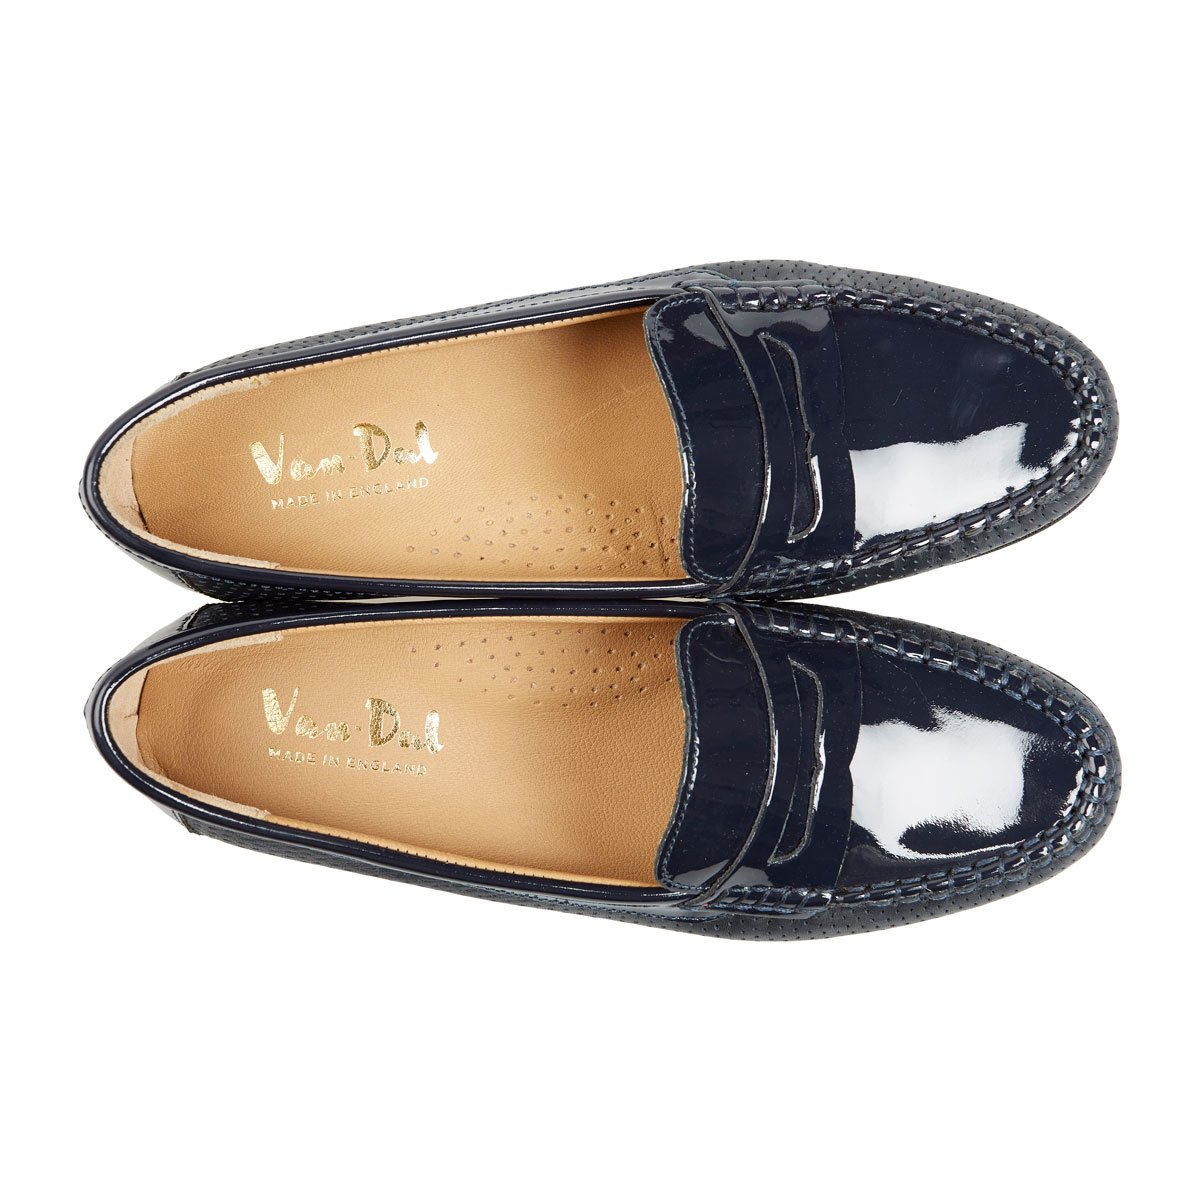 Sandales Plateforme femme Van Dal